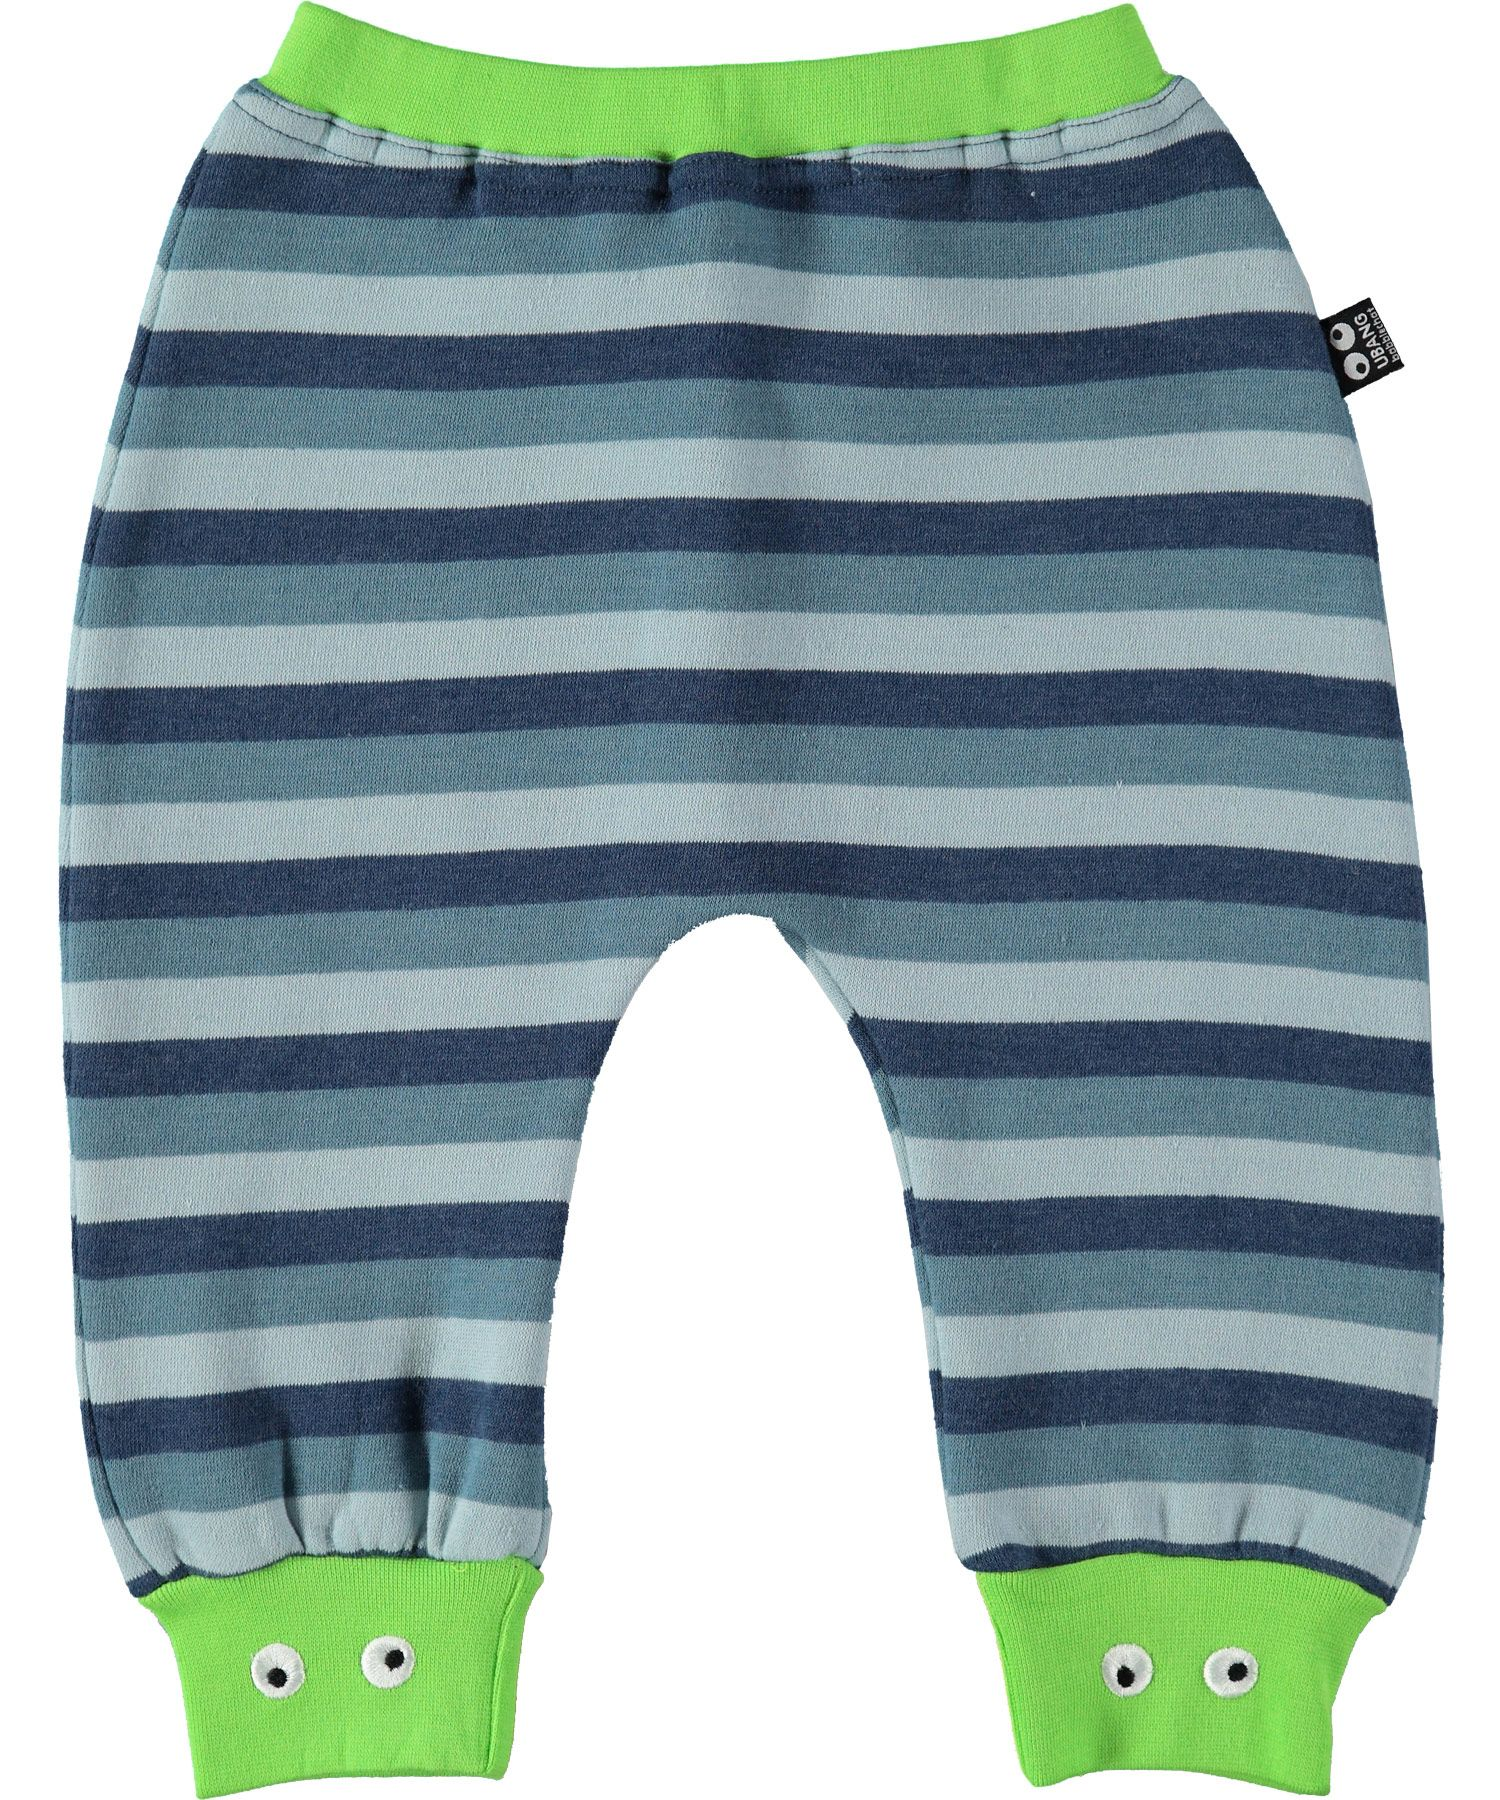 3f66915af2274 Ubang Babblechat wonderful blue striped baby pants.  ubang-babblechat.en.emilea.be